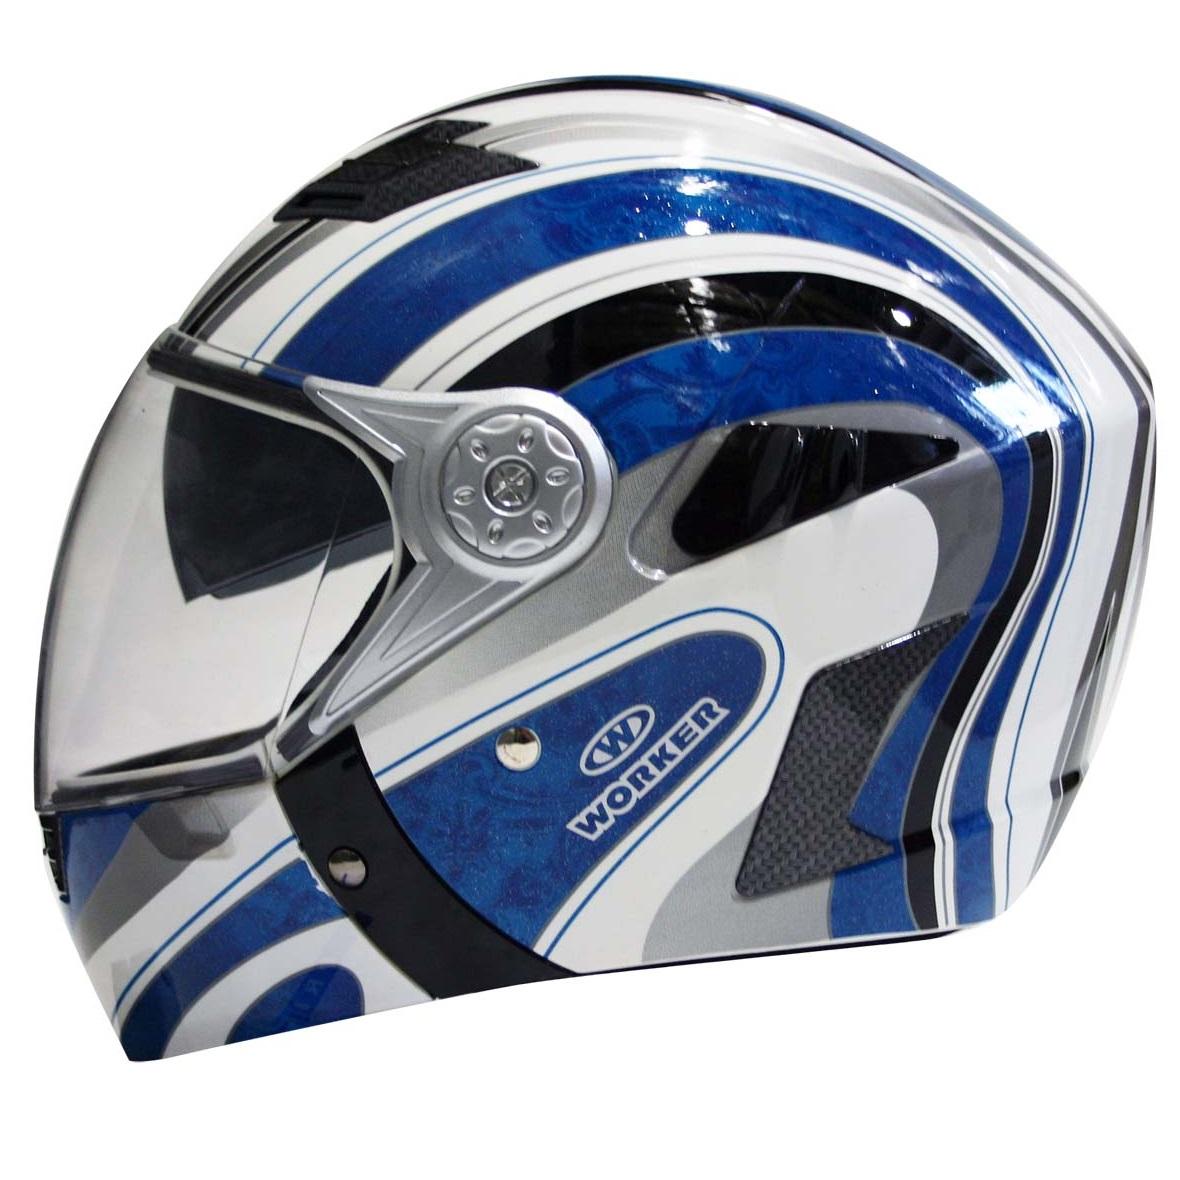 Moto helma WORKER V220 modrá - XL (61-62)